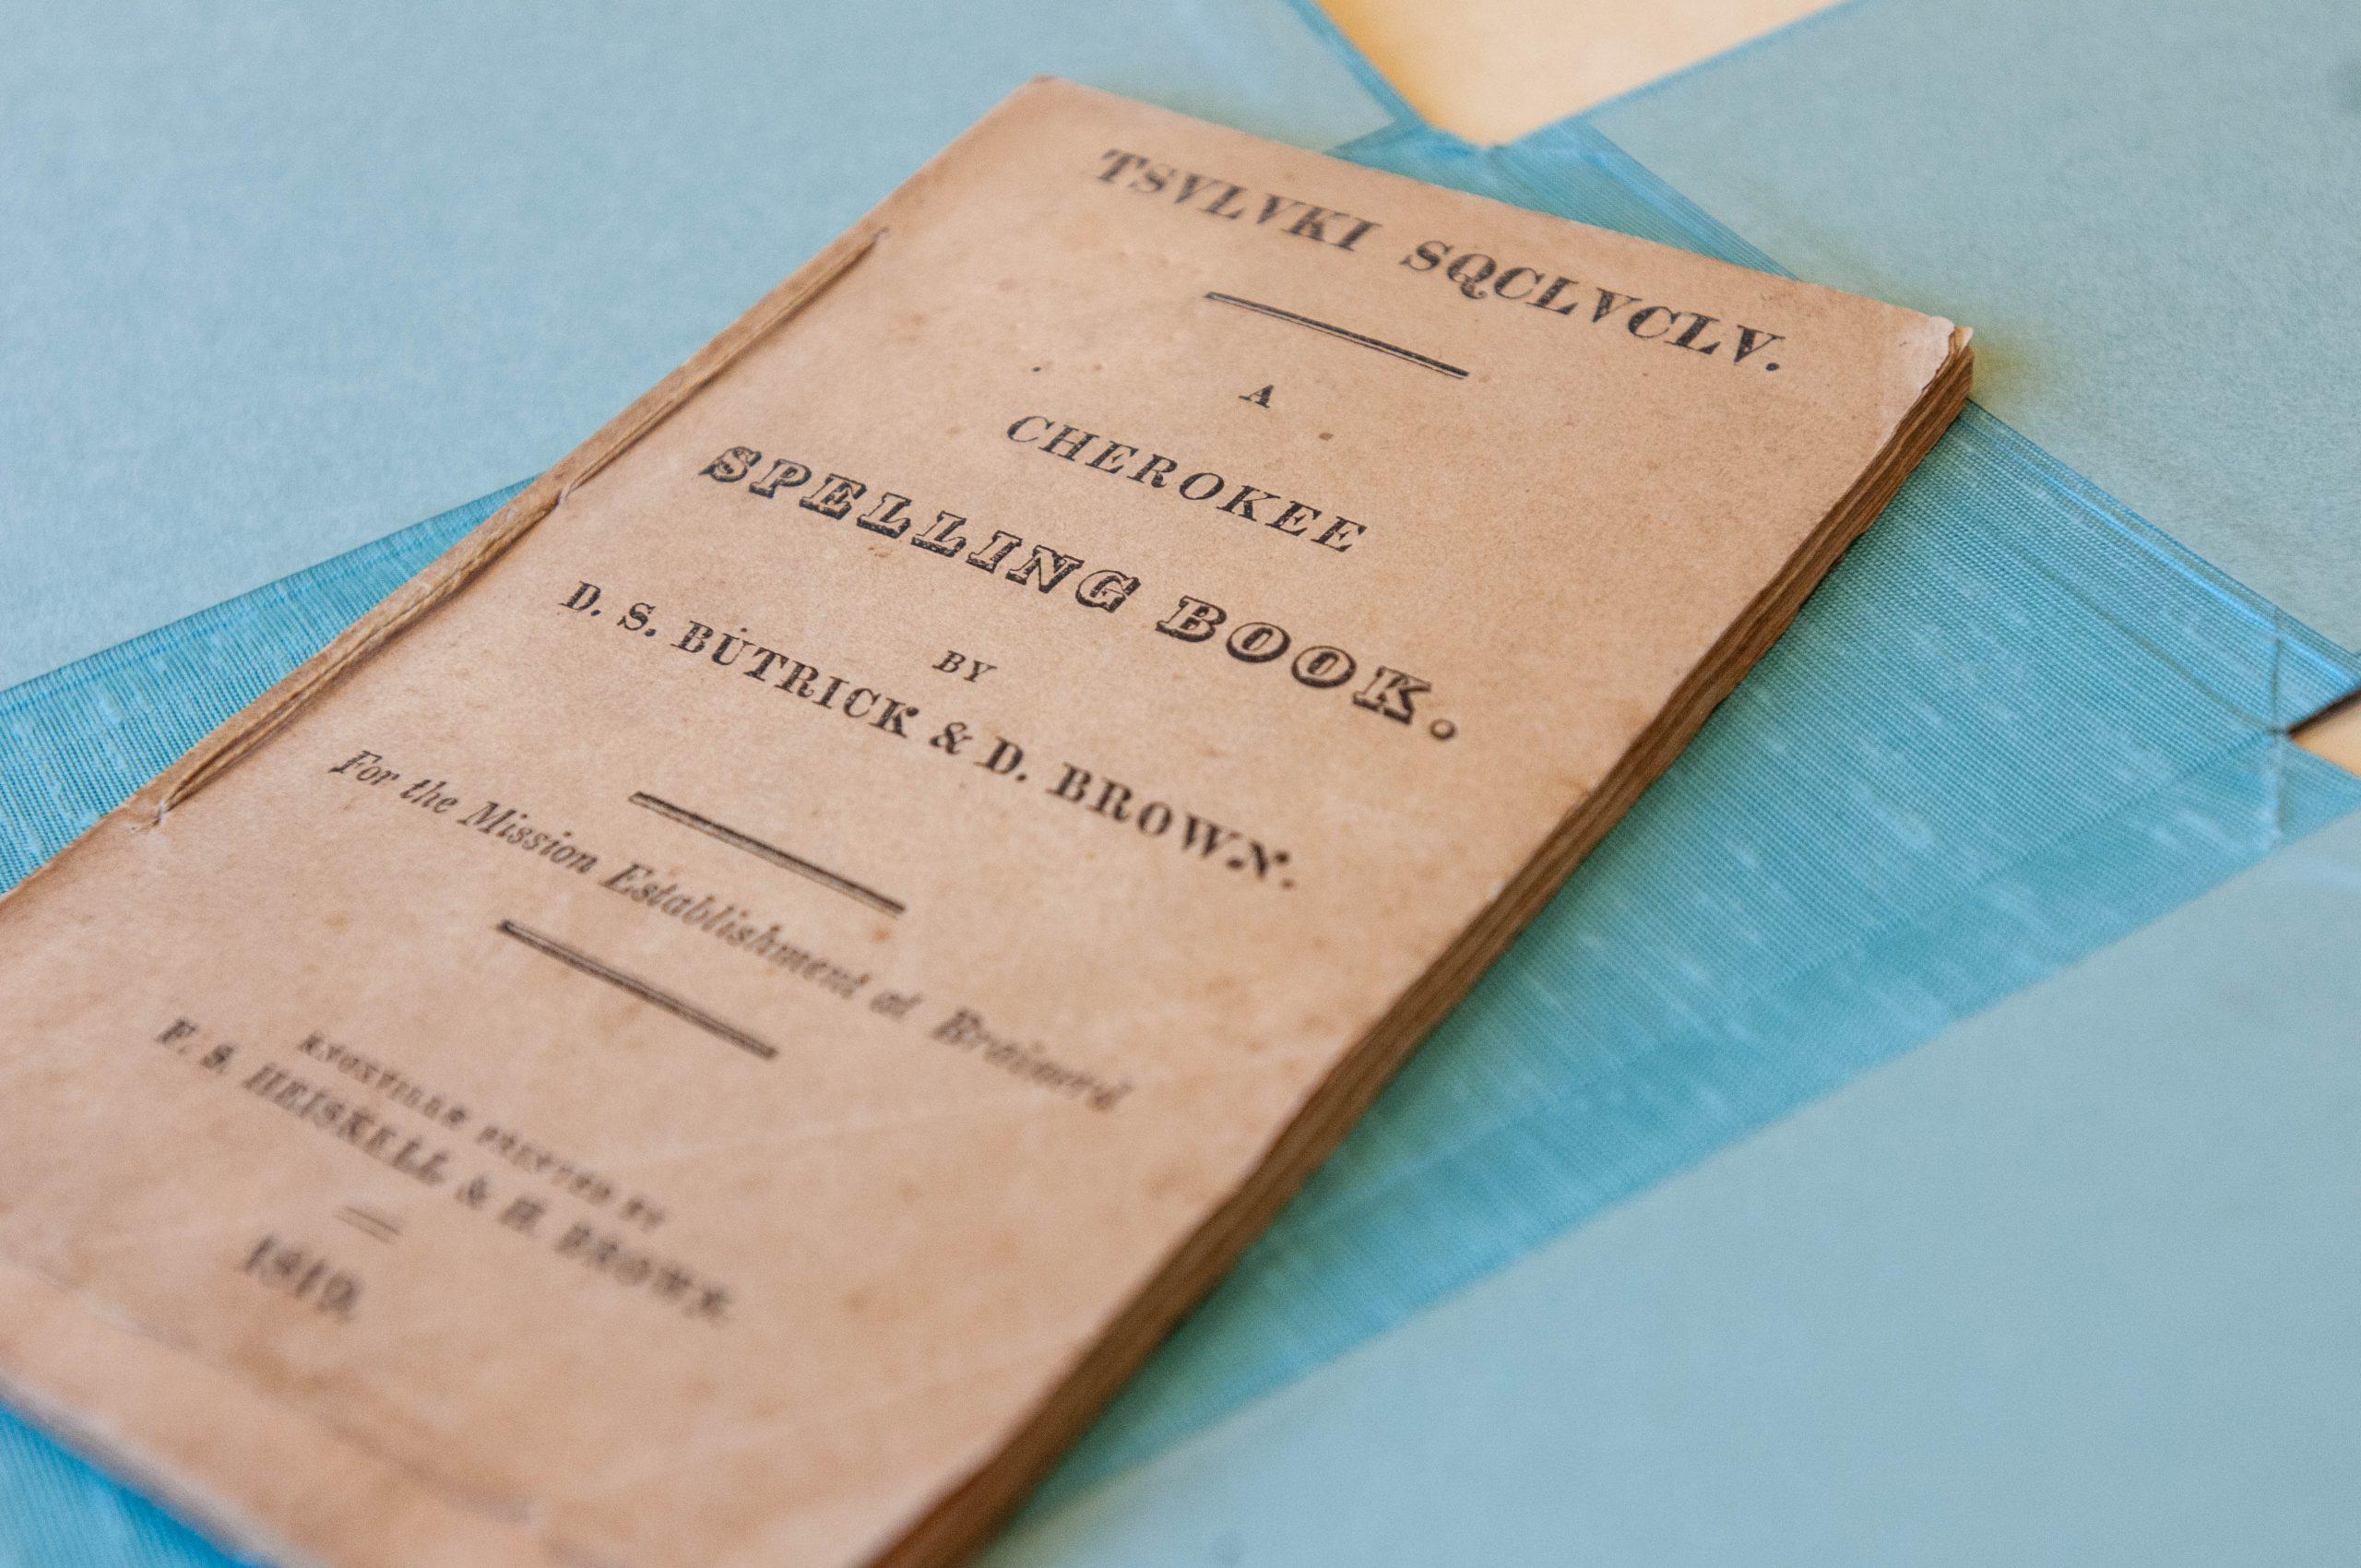 TSVLVKI SQCLVCLV: A Cherokee Spelling Book